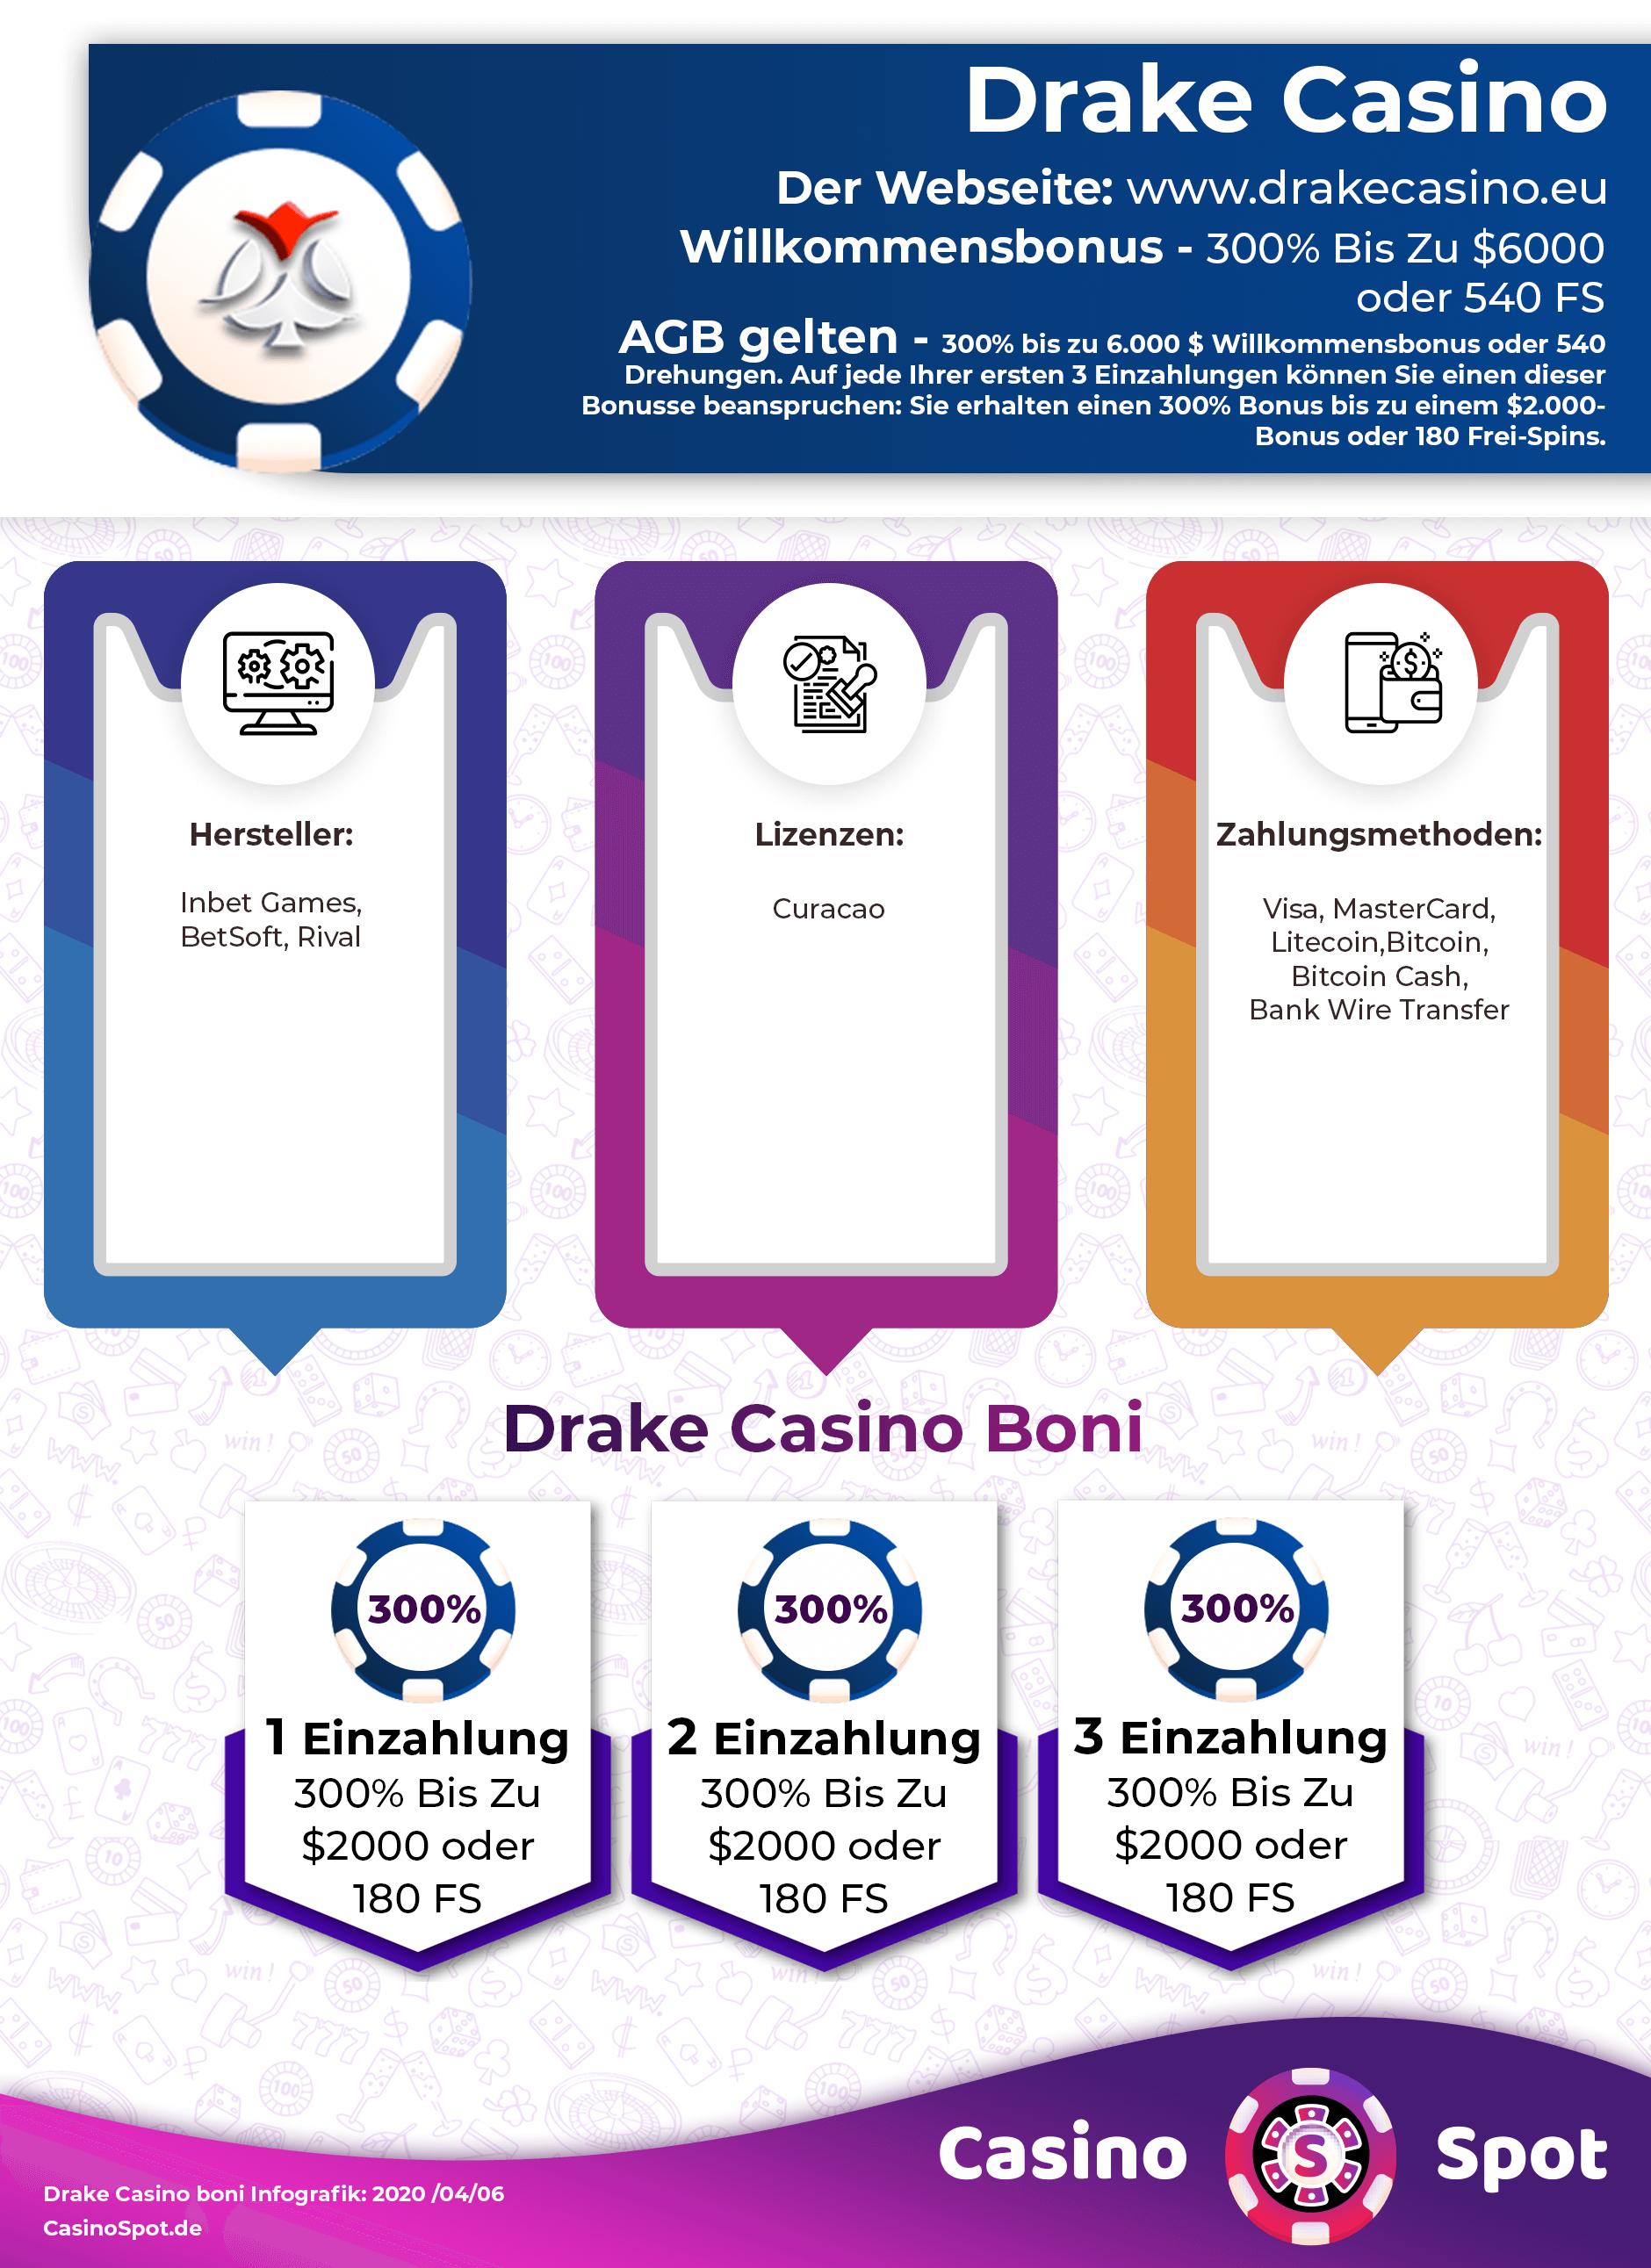 Drake Casino Bonus Codes 2021